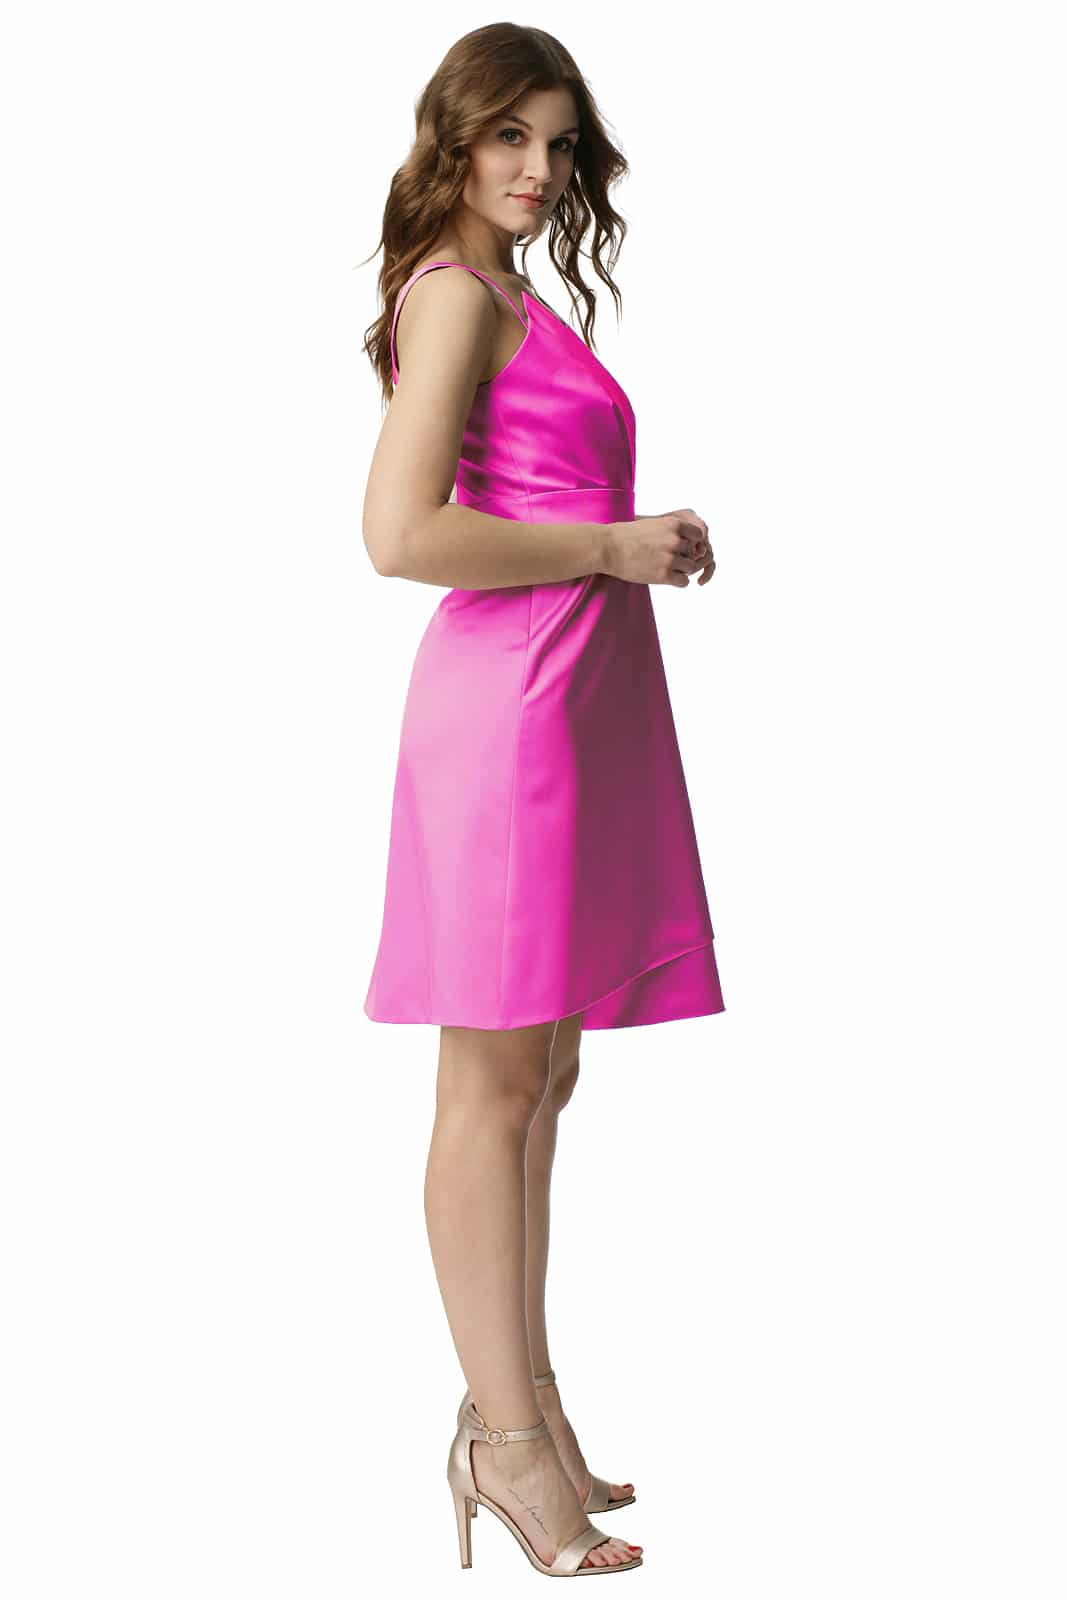 f67adc59e0 Elegancka amarantowa sukienka Lidia - Modesta - ponad 30 lat na rynku